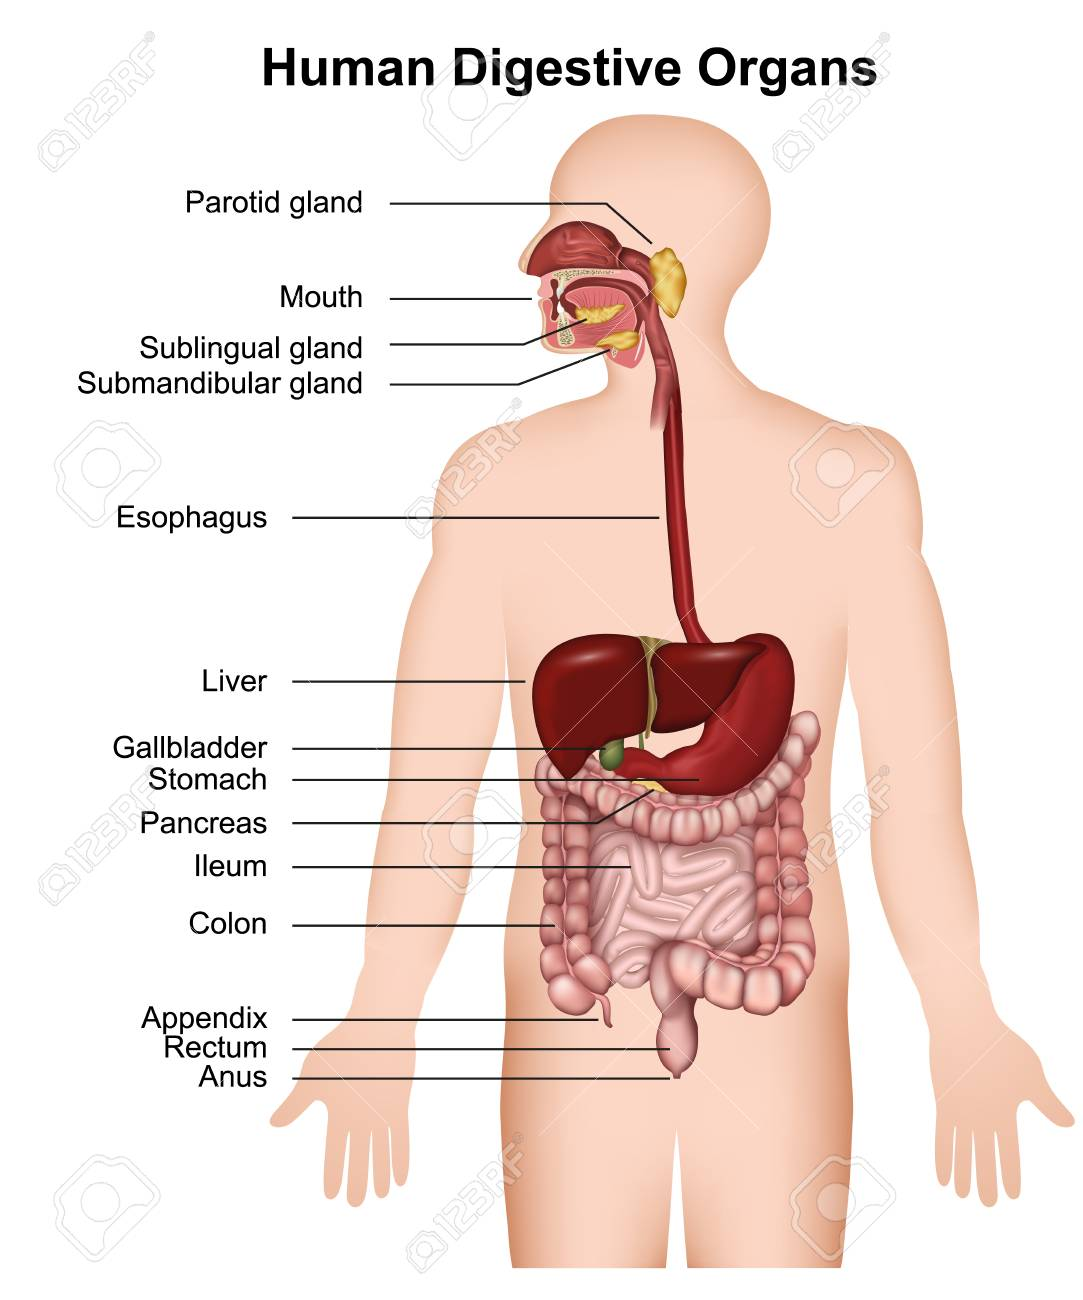 Human digestive system with description 3d medical vector illustration - 117794785